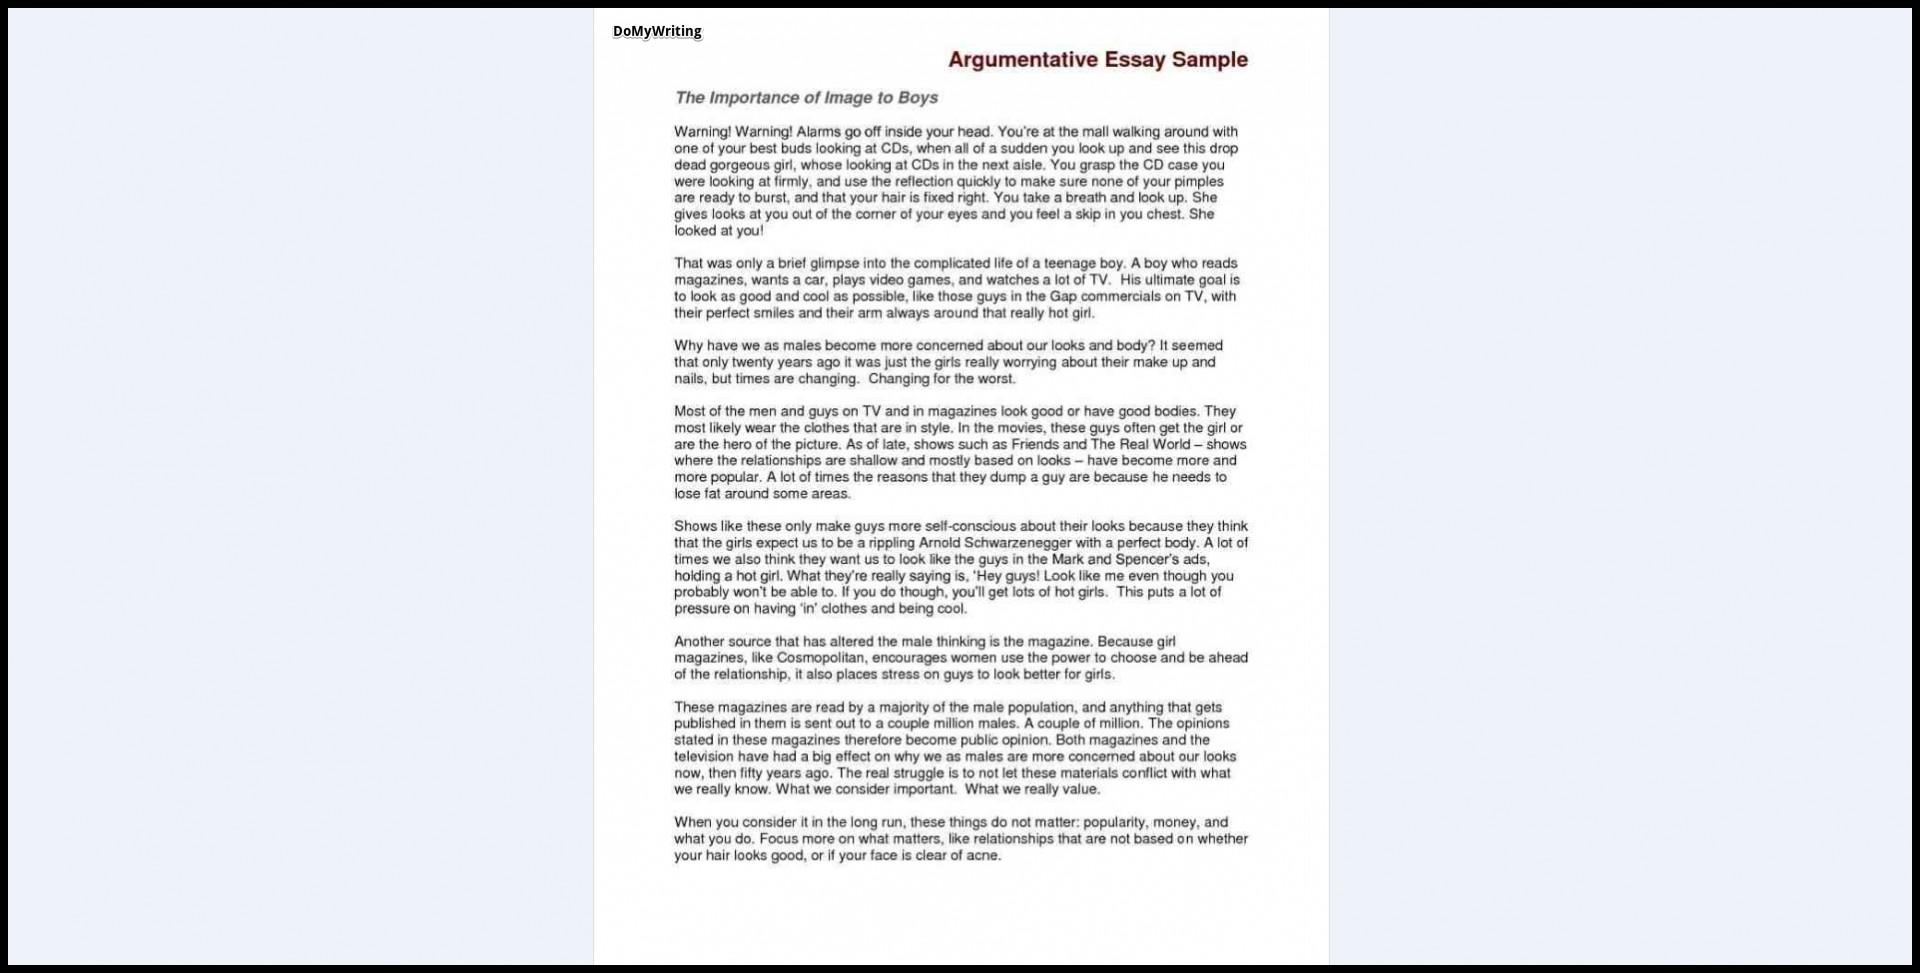 003 Essay Example Argumentative Sample Who Are Rare You Question Describe 1920